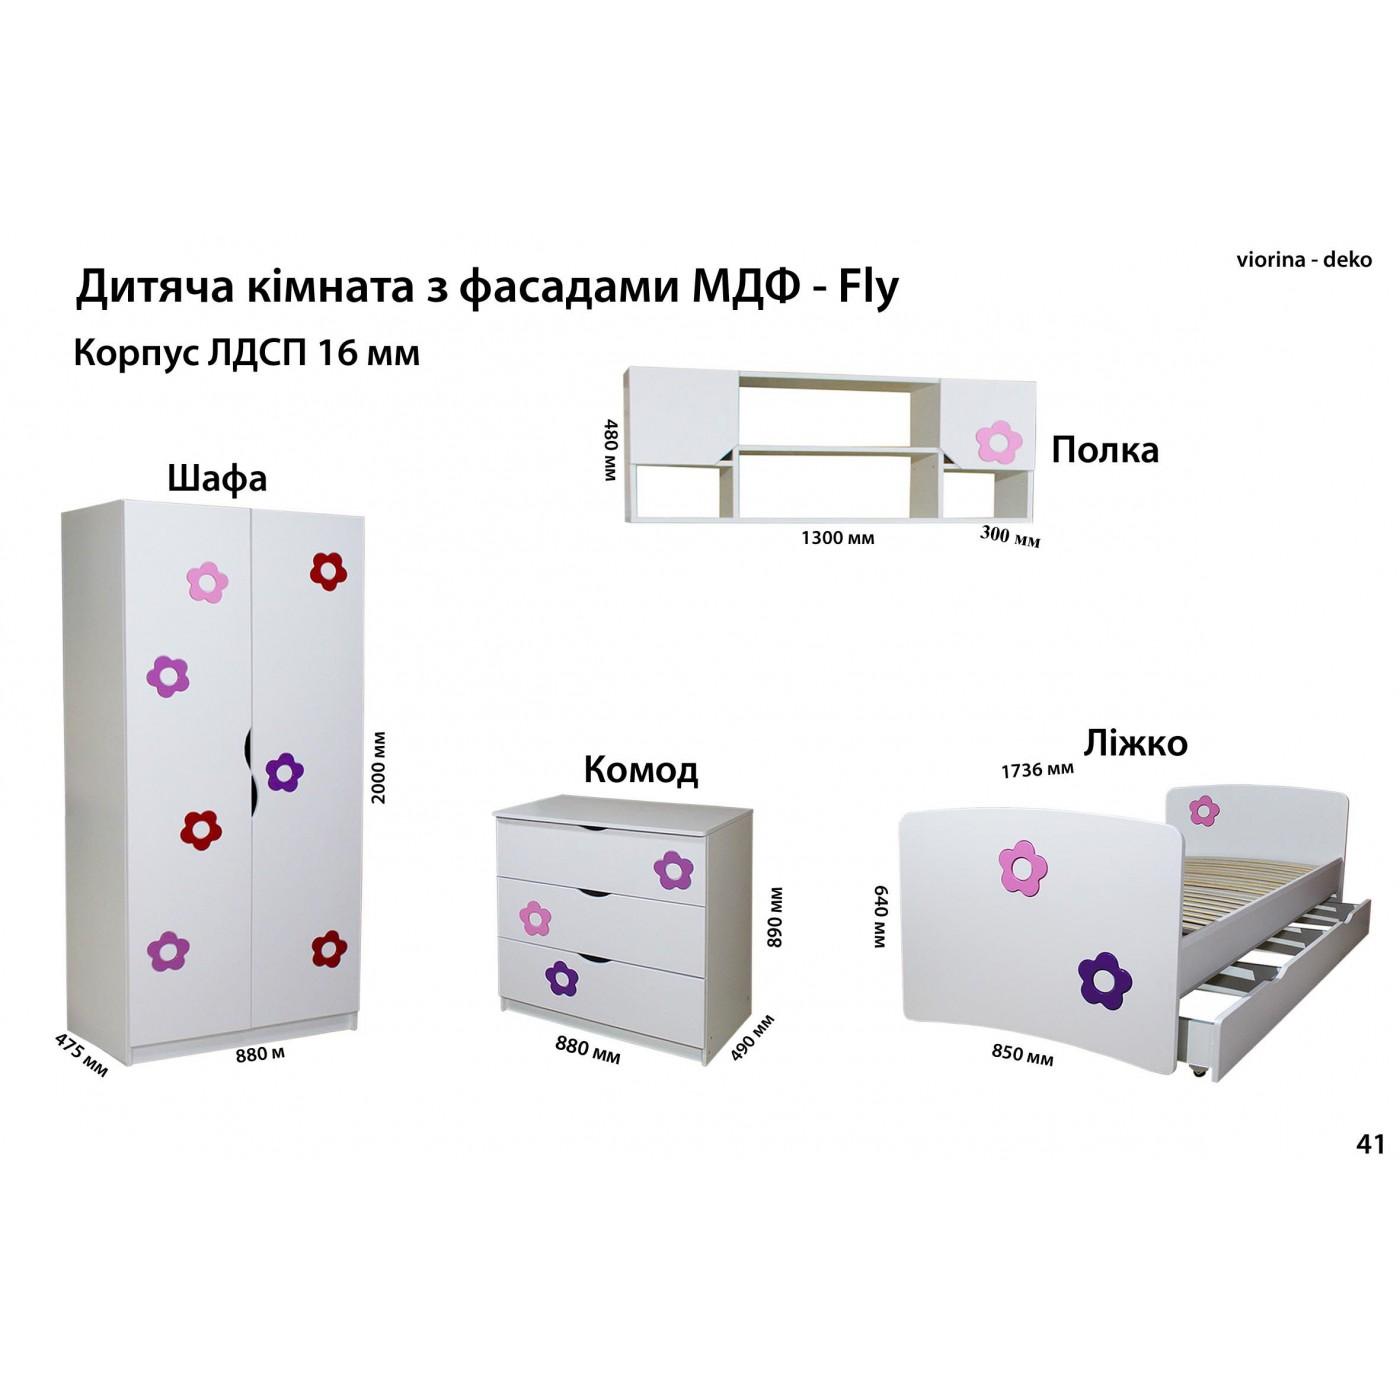 "Комод №1, №2, №3  Серии ""MDF FLY"" от viorino-deko"